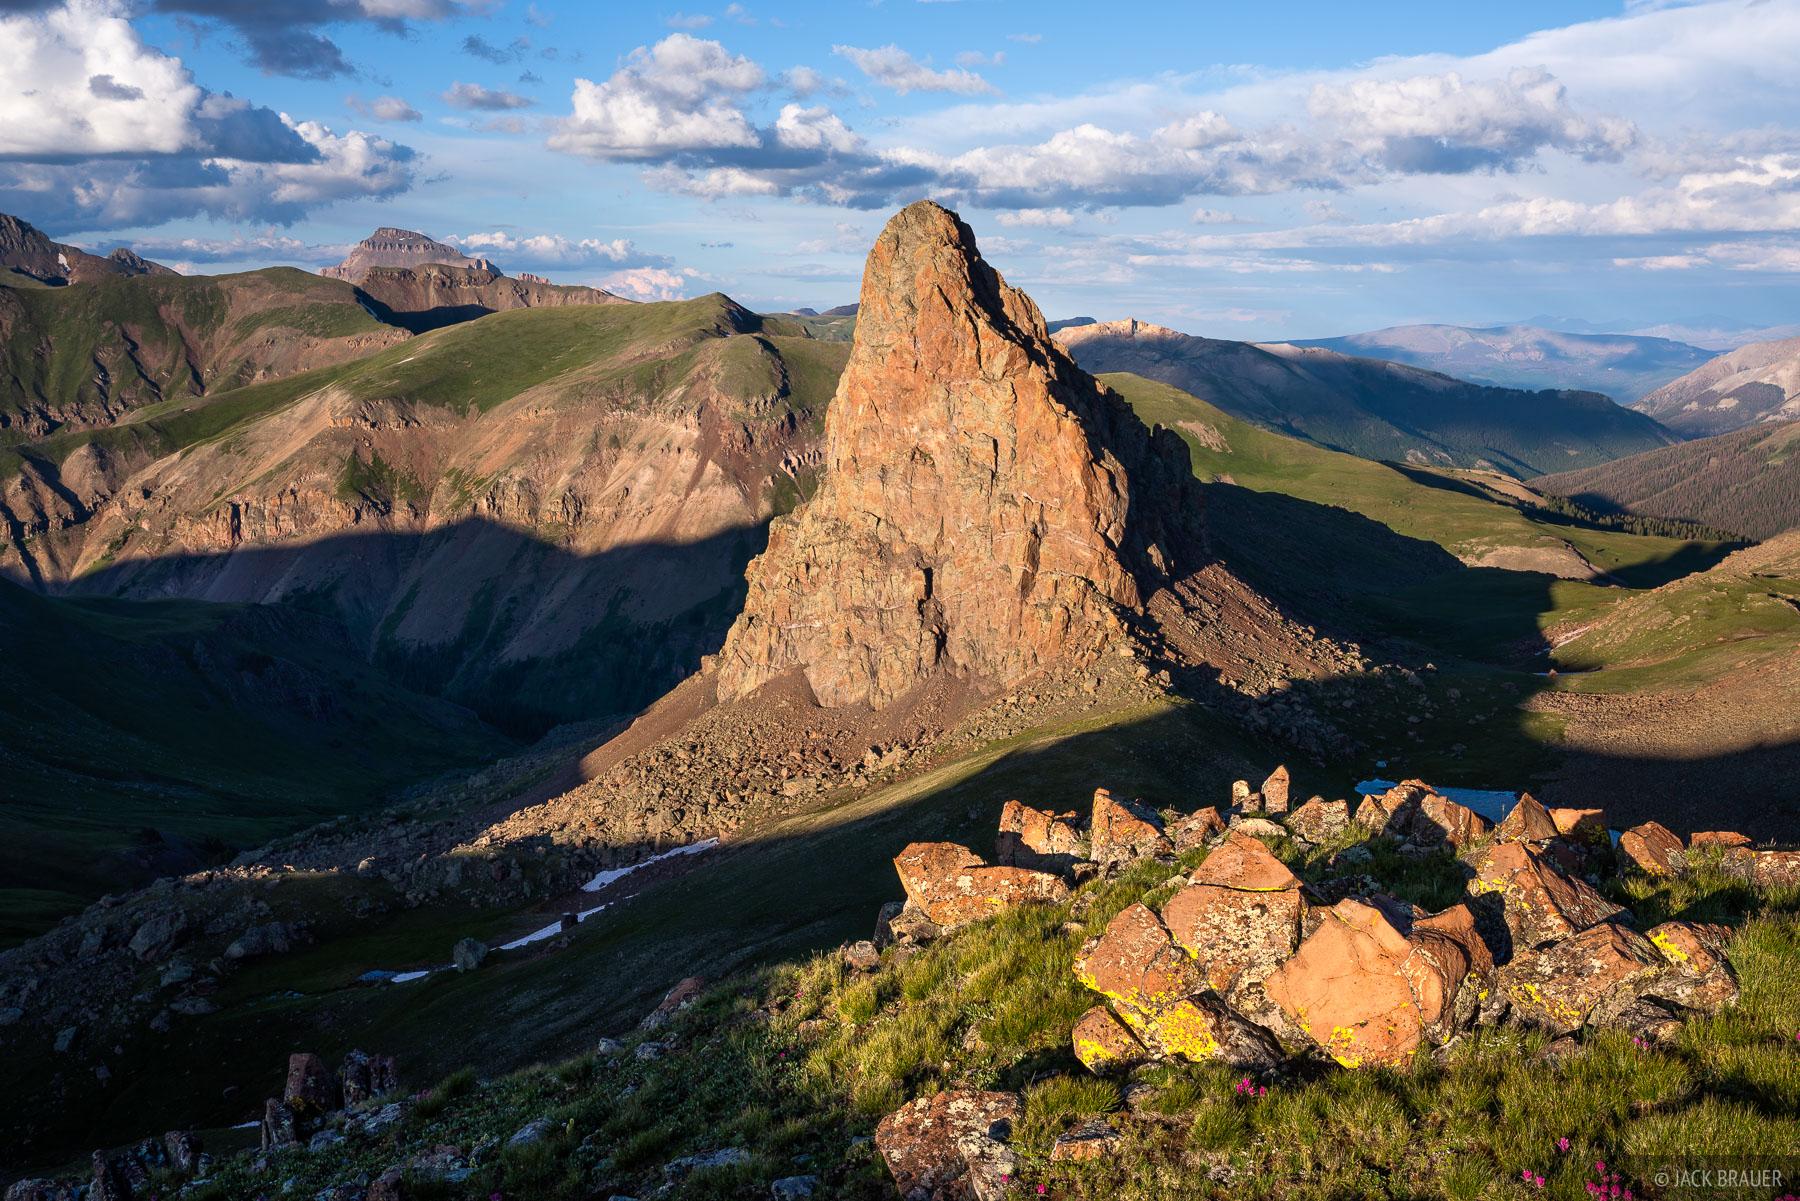 Colorado, Dragonsback, San Juan Mountains, Uncompahgre Wilderness, photo